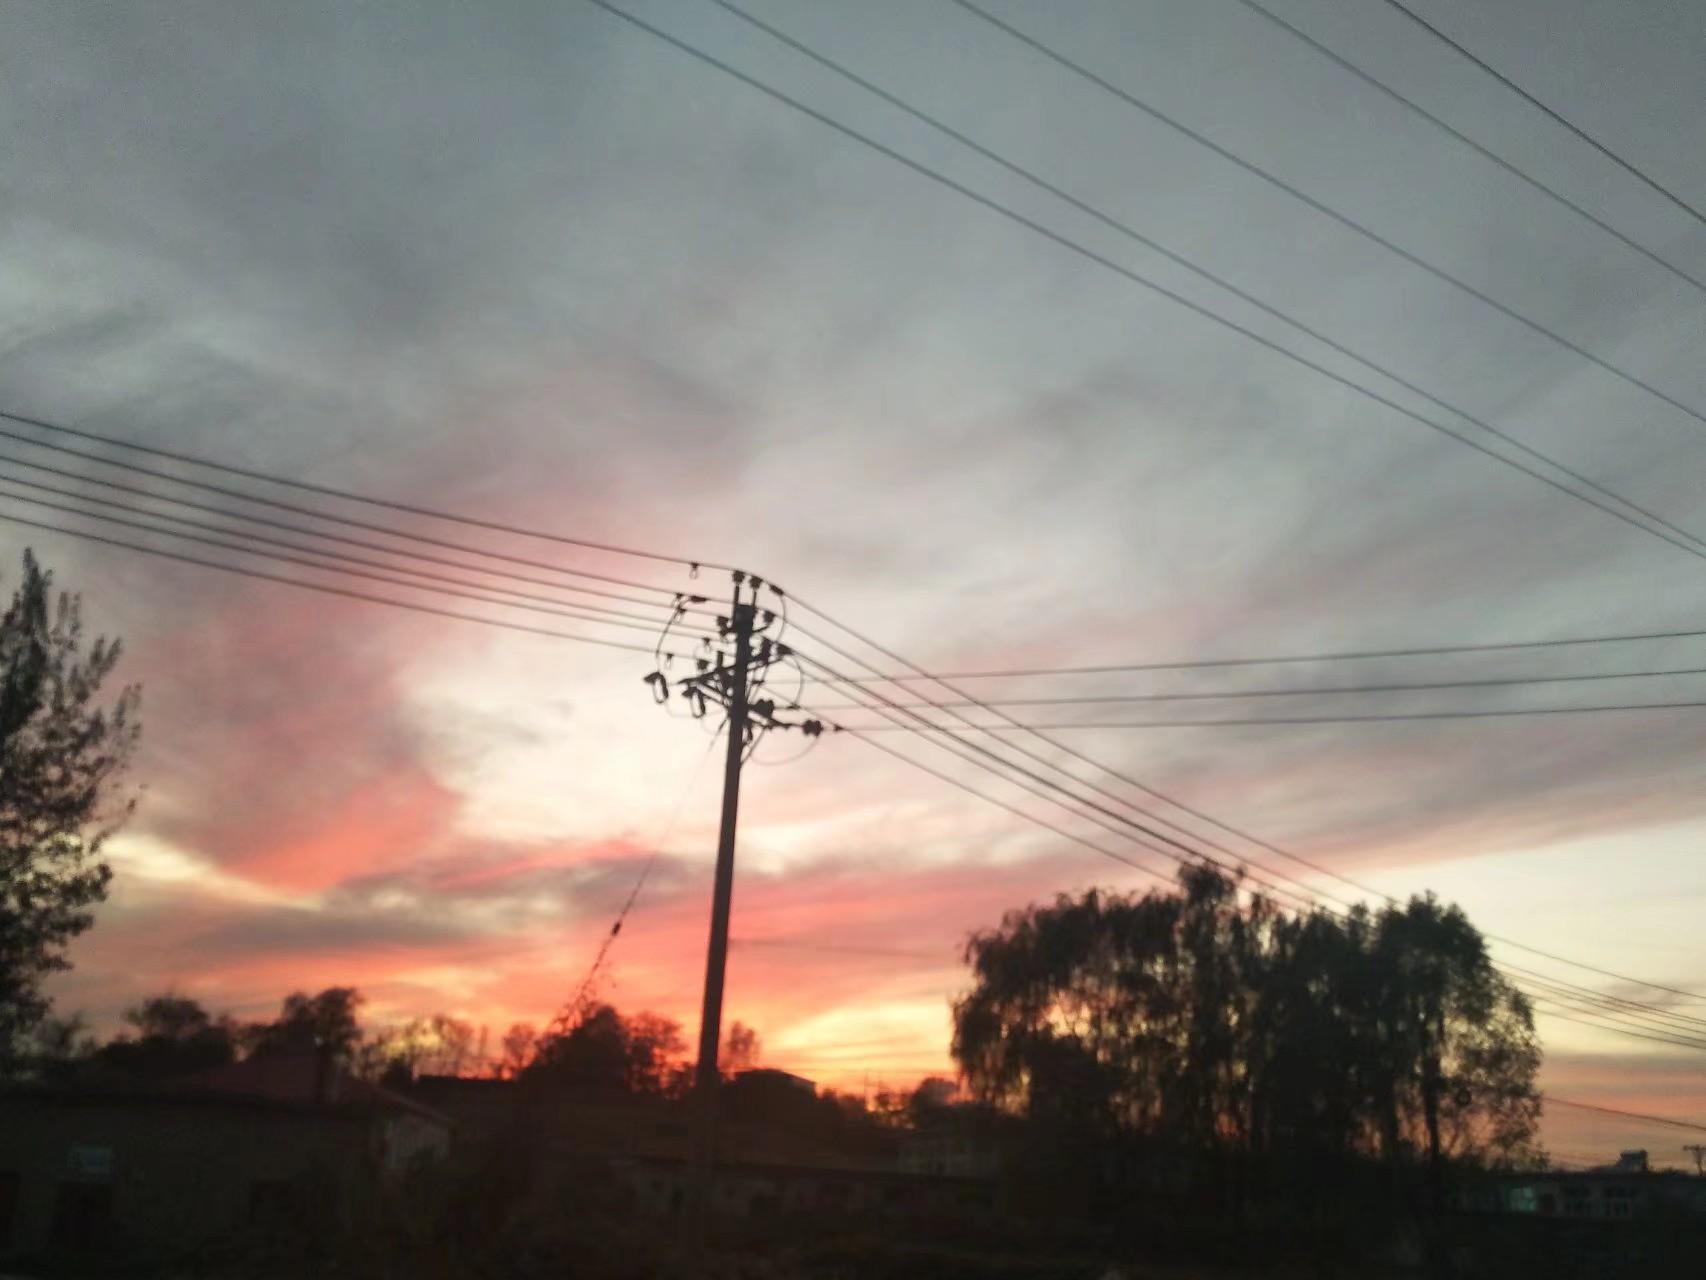 【vivoX9】拍摄—落日余晖